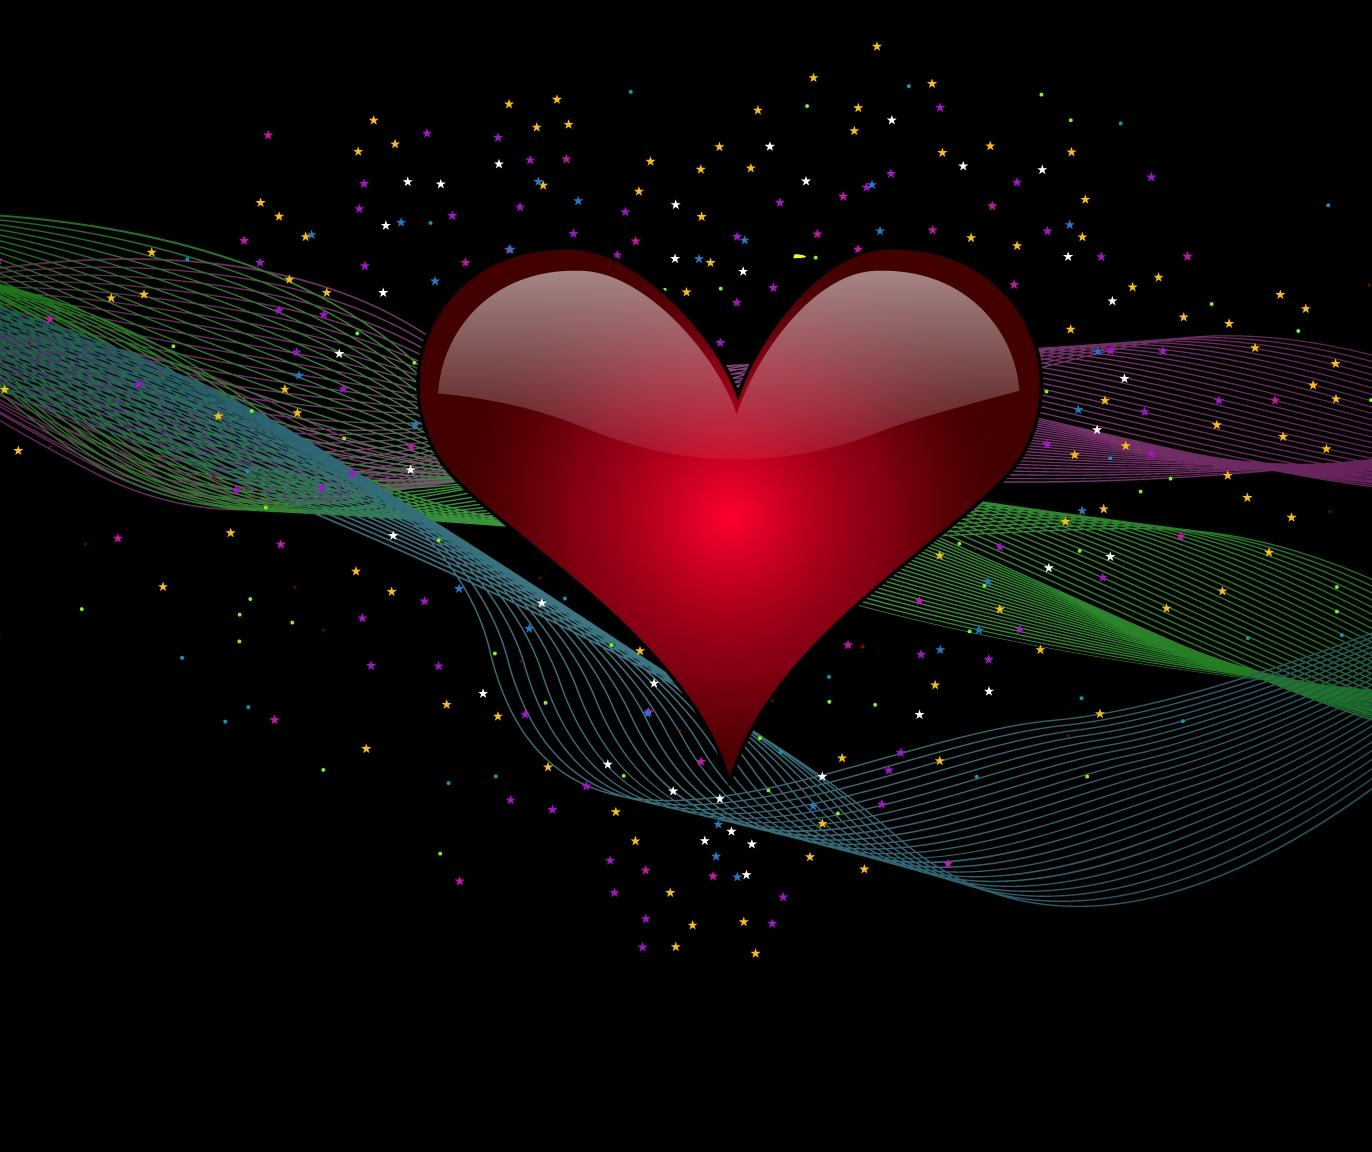 desktop wallpaper love: Free Wallpicz: Wallpaper Desktop Love